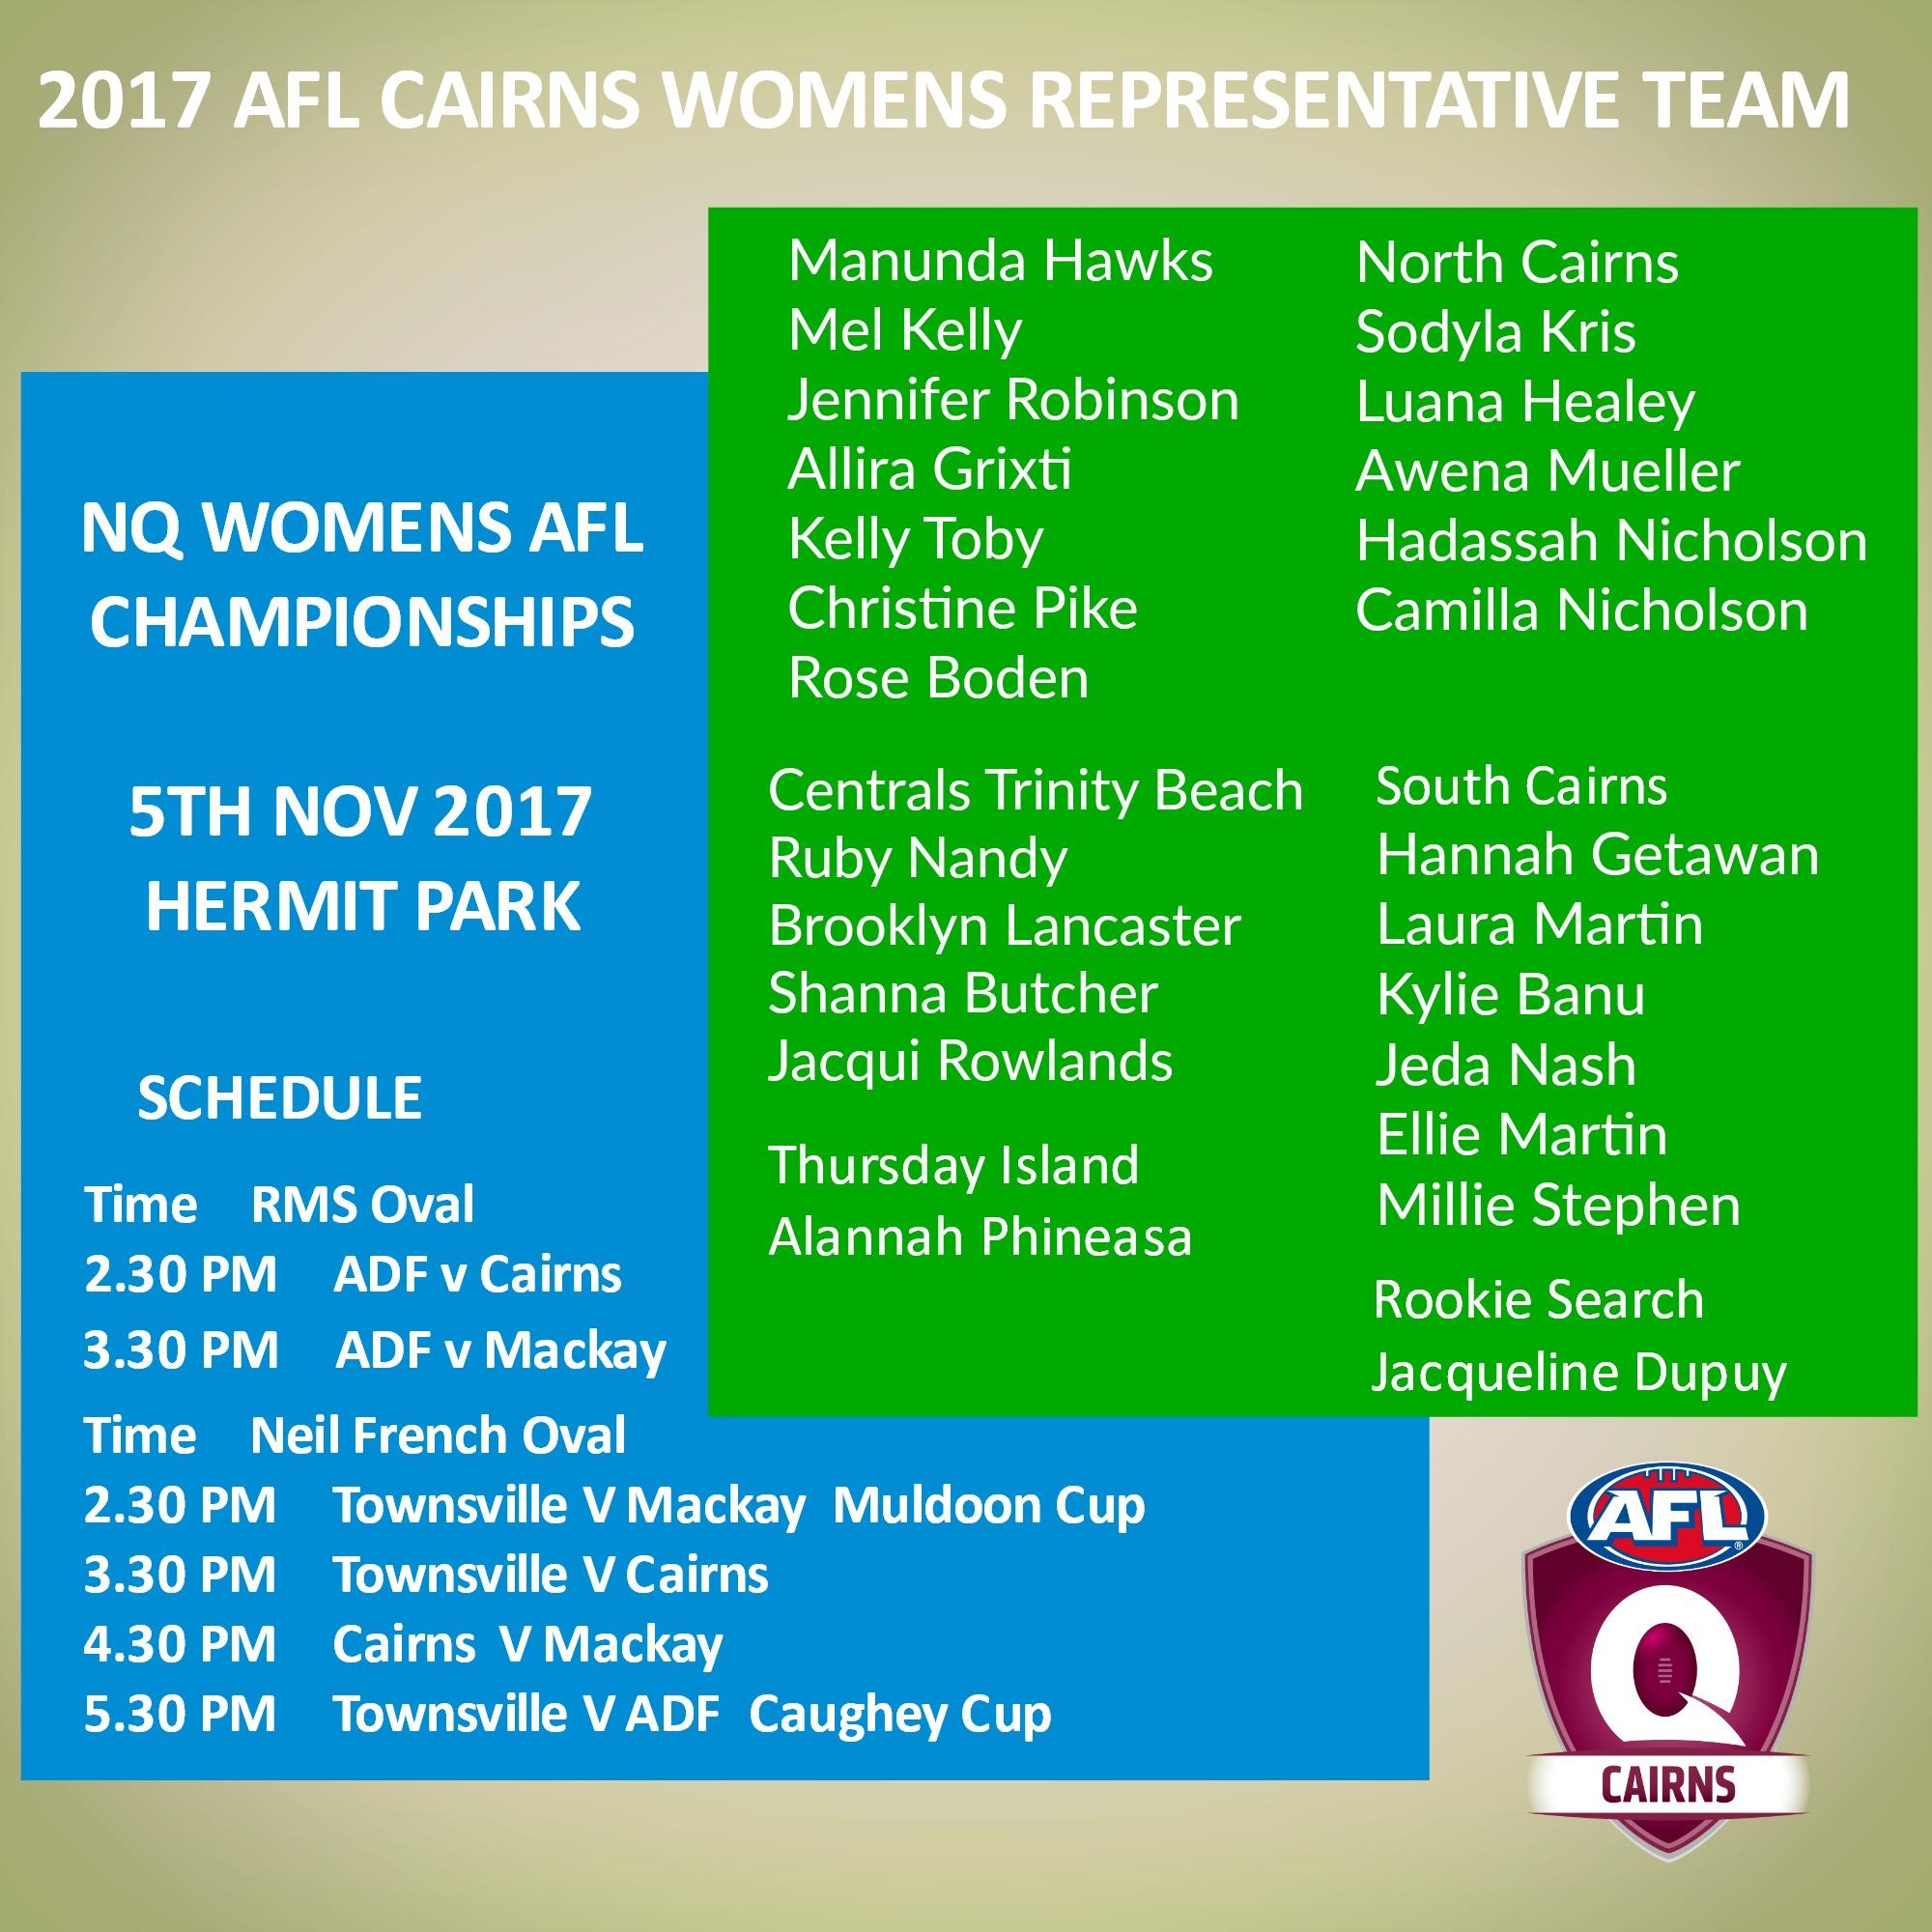 REP TEAM 2017 Women (3)